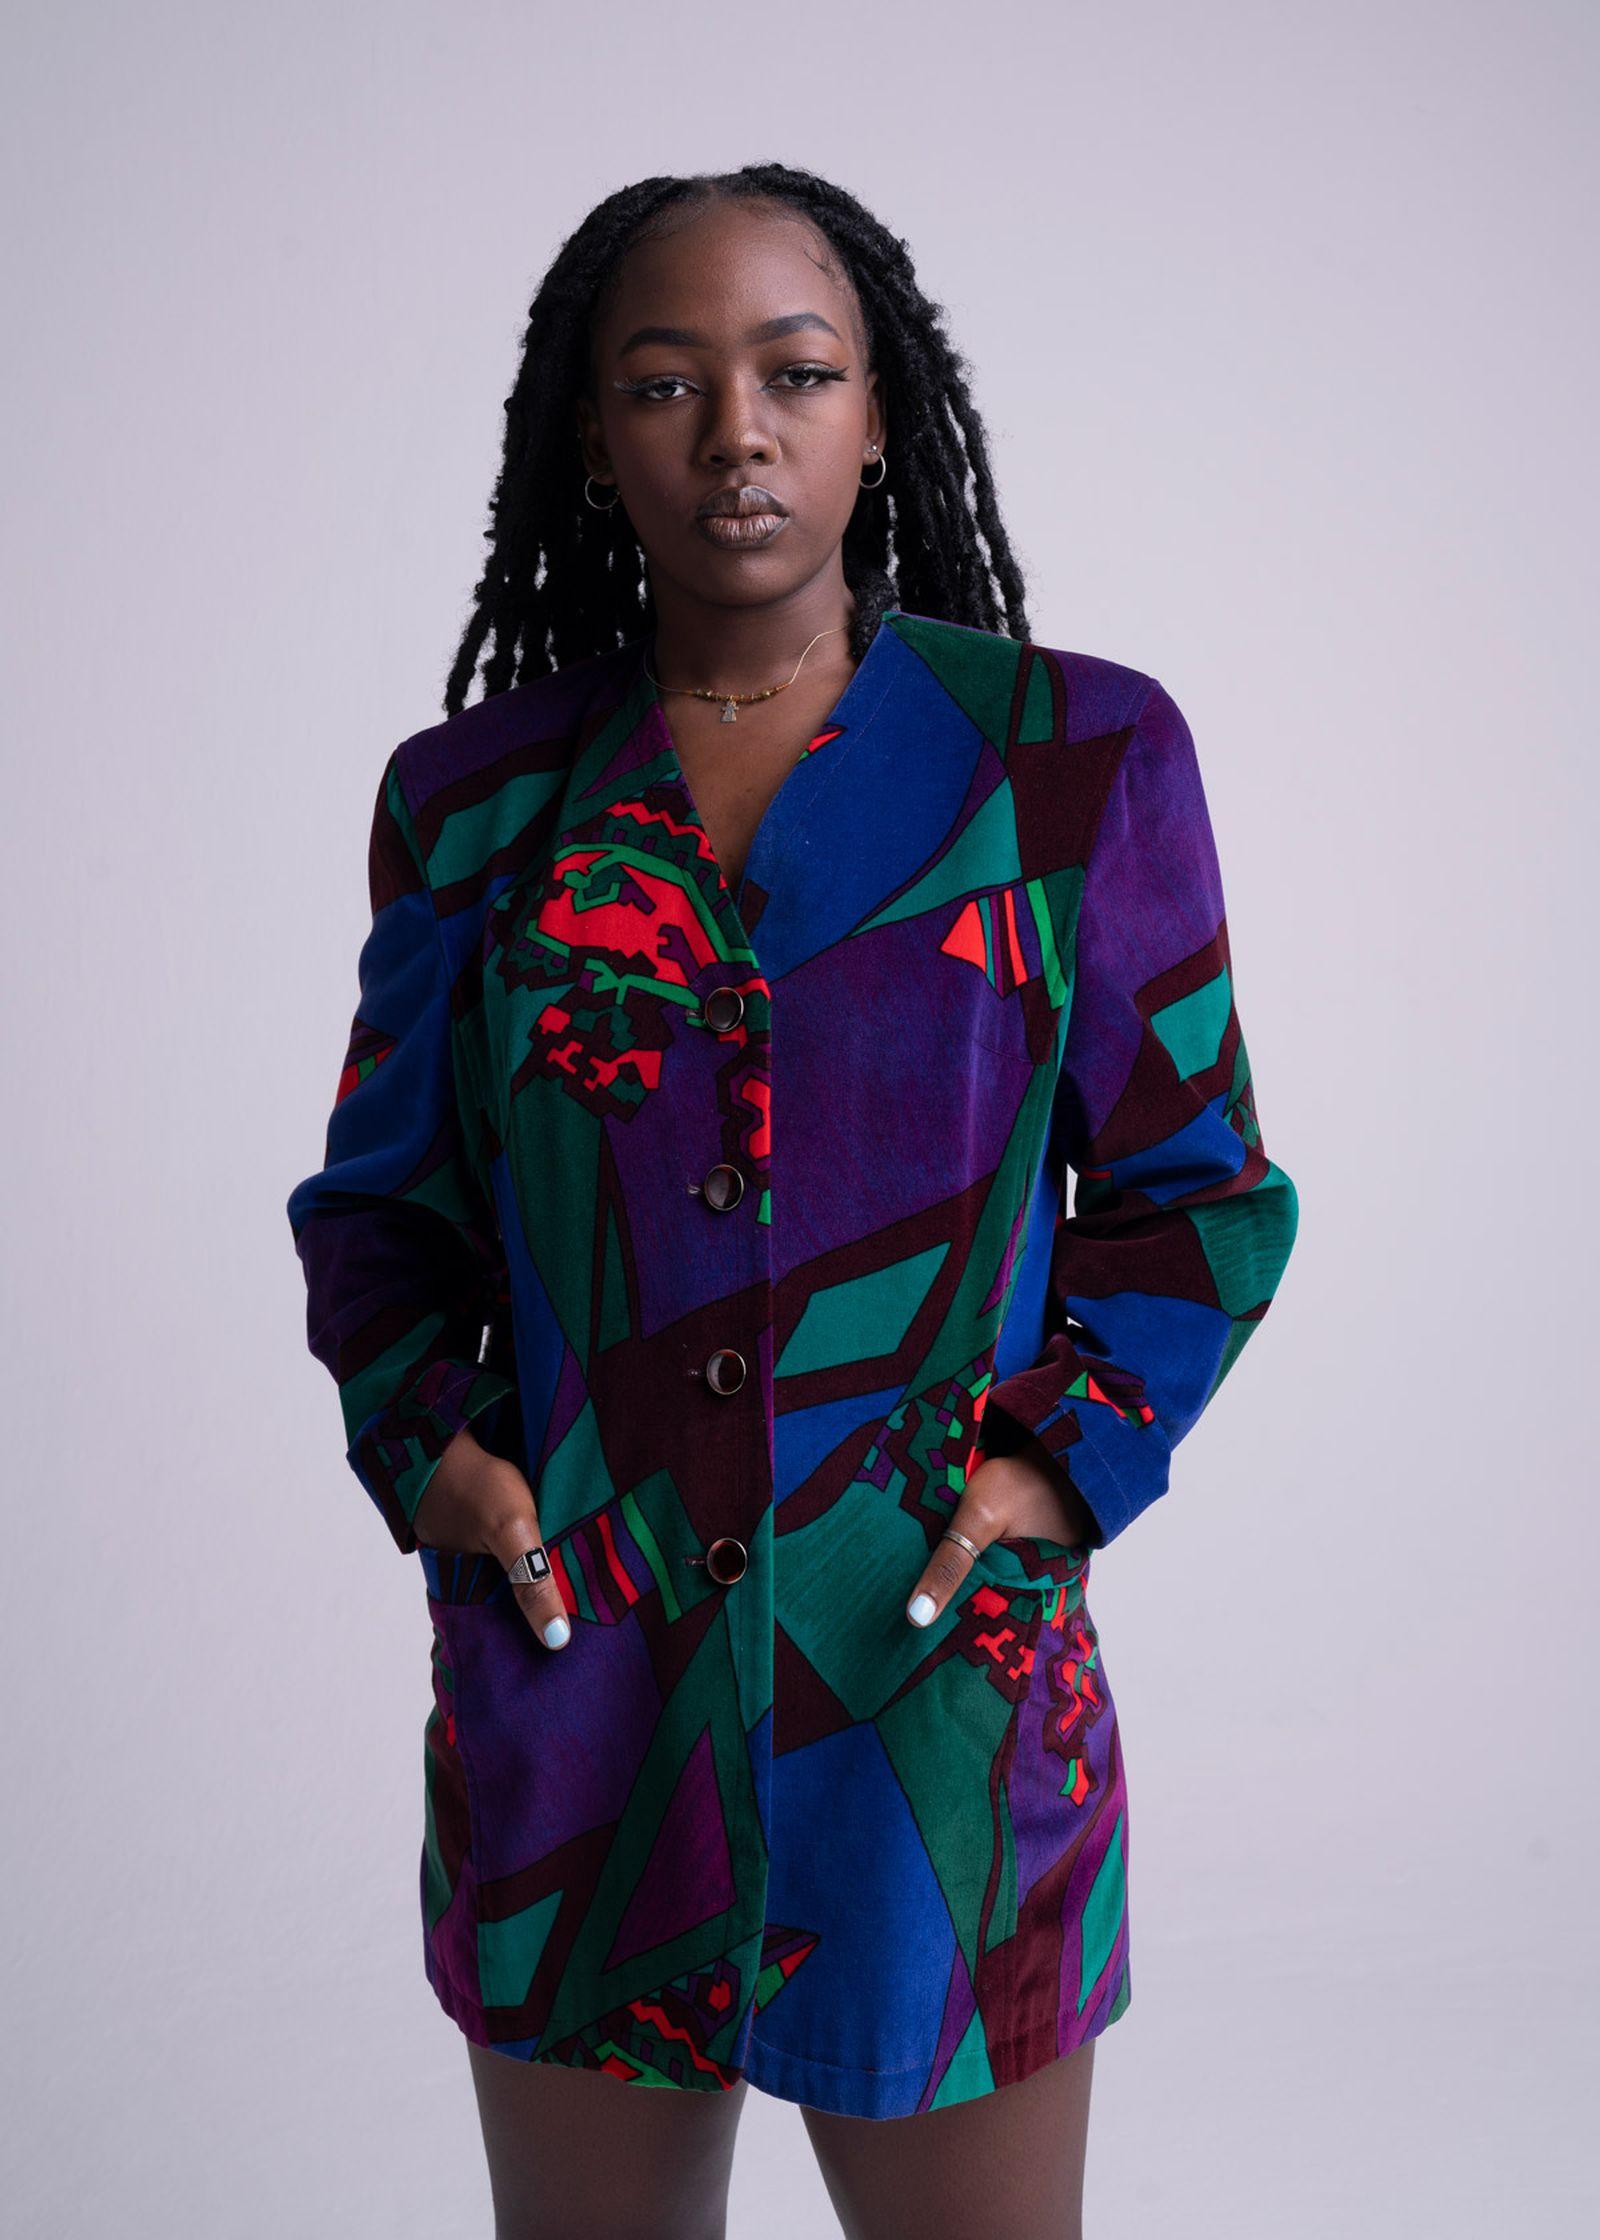 elsa-majimbo-interview-04